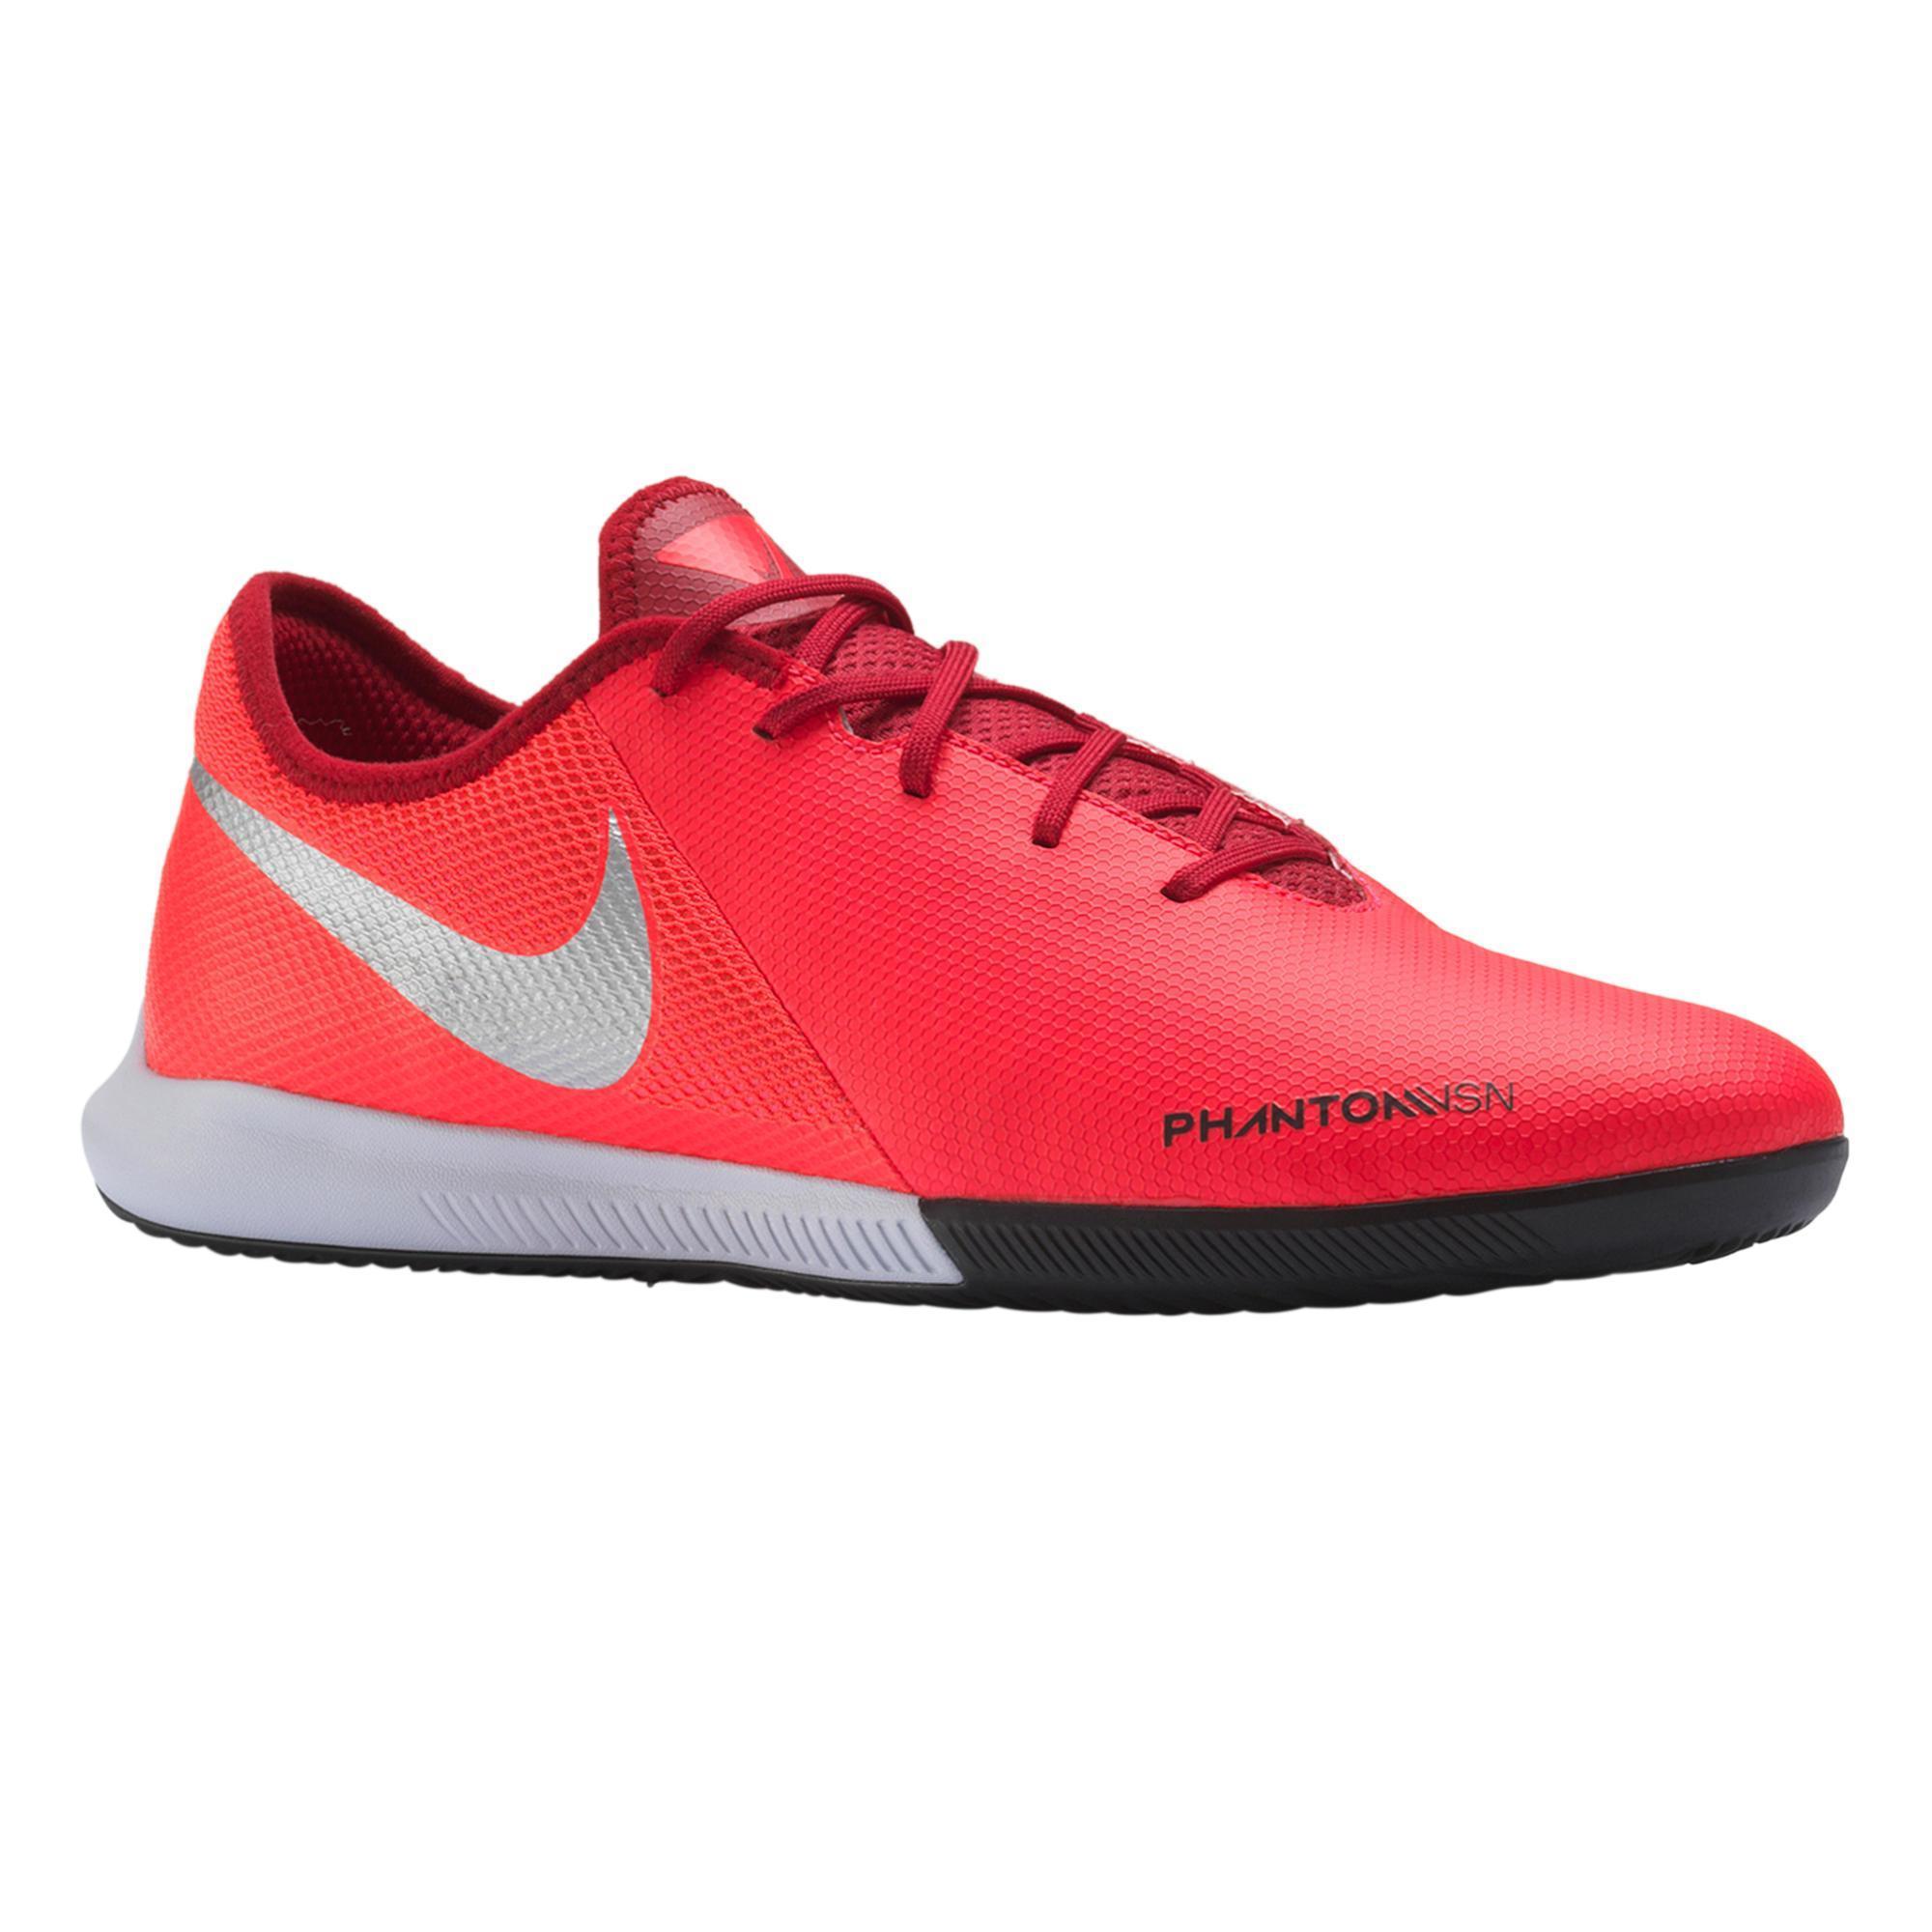 Hallenschuhe Futsal Fußball Phantom Vision Gato FS19 Erwachsene silberrot | Schuhe > Sportschuhe > Hallenschuhe | Nike